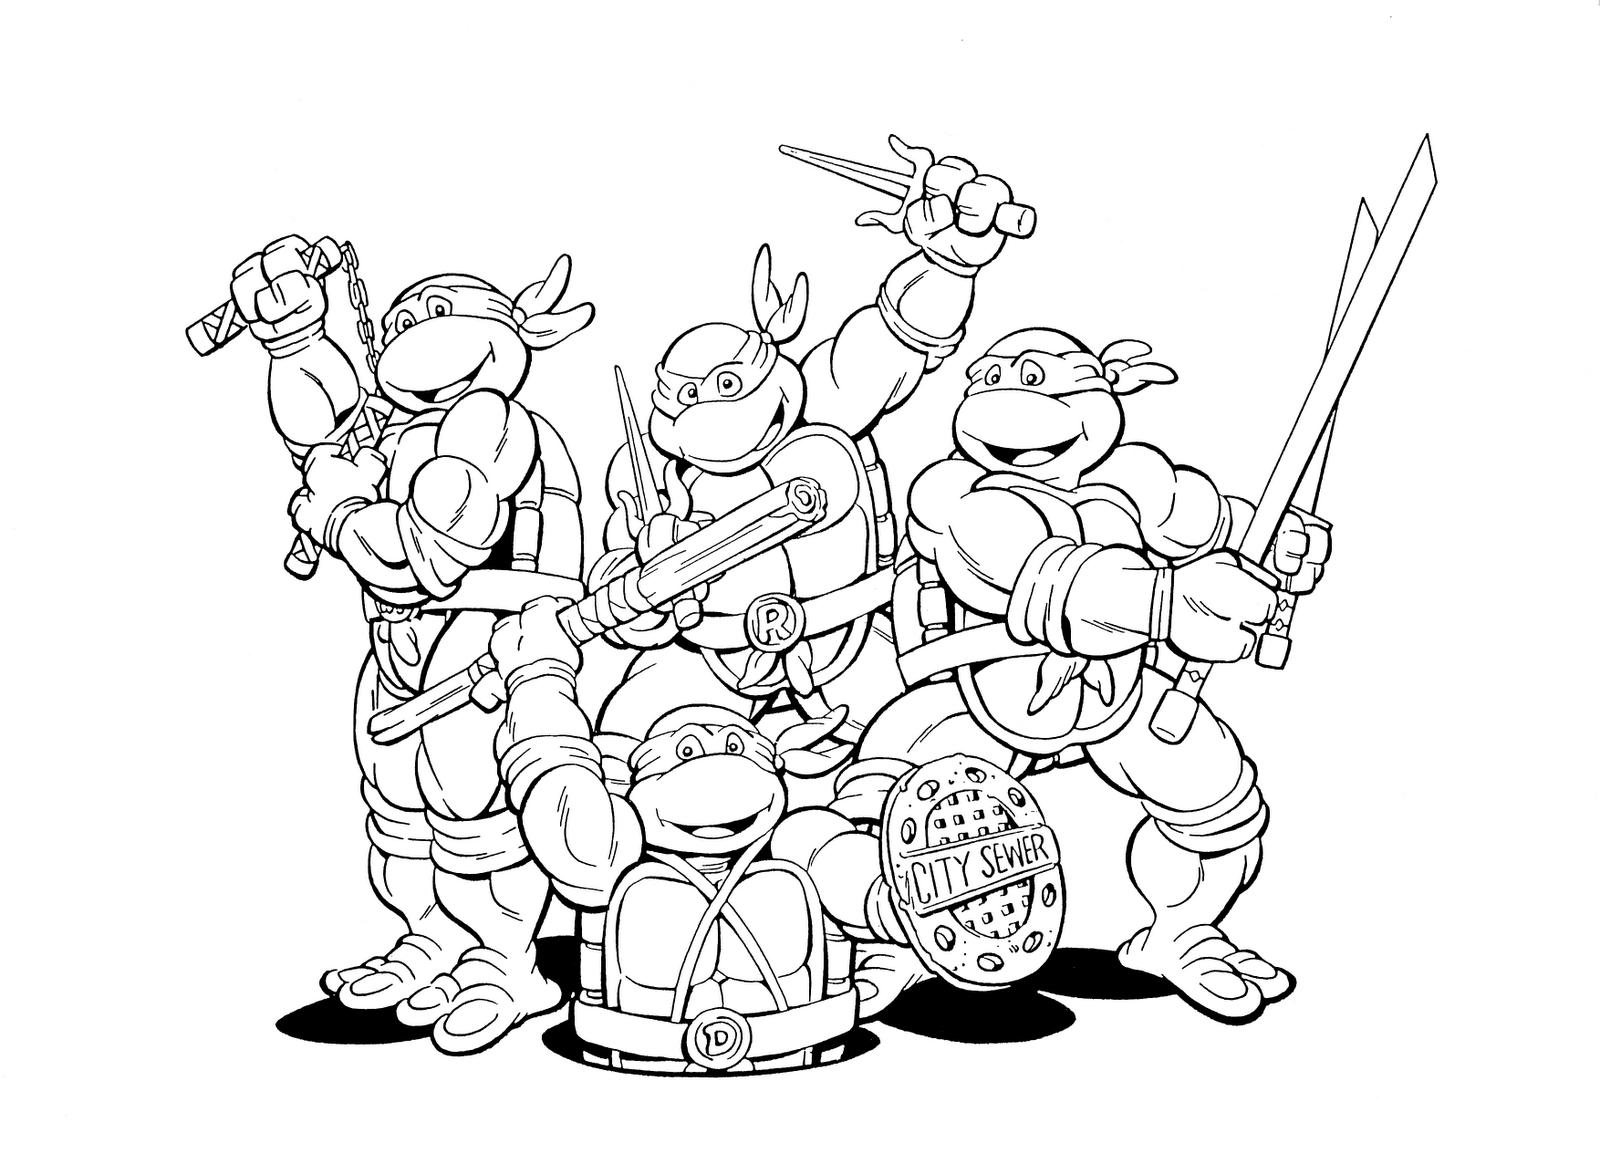 ninja turtle printable coloring pages teenage mutant ninja turtles coloring pages learny kids turtle ninja coloring pages printable